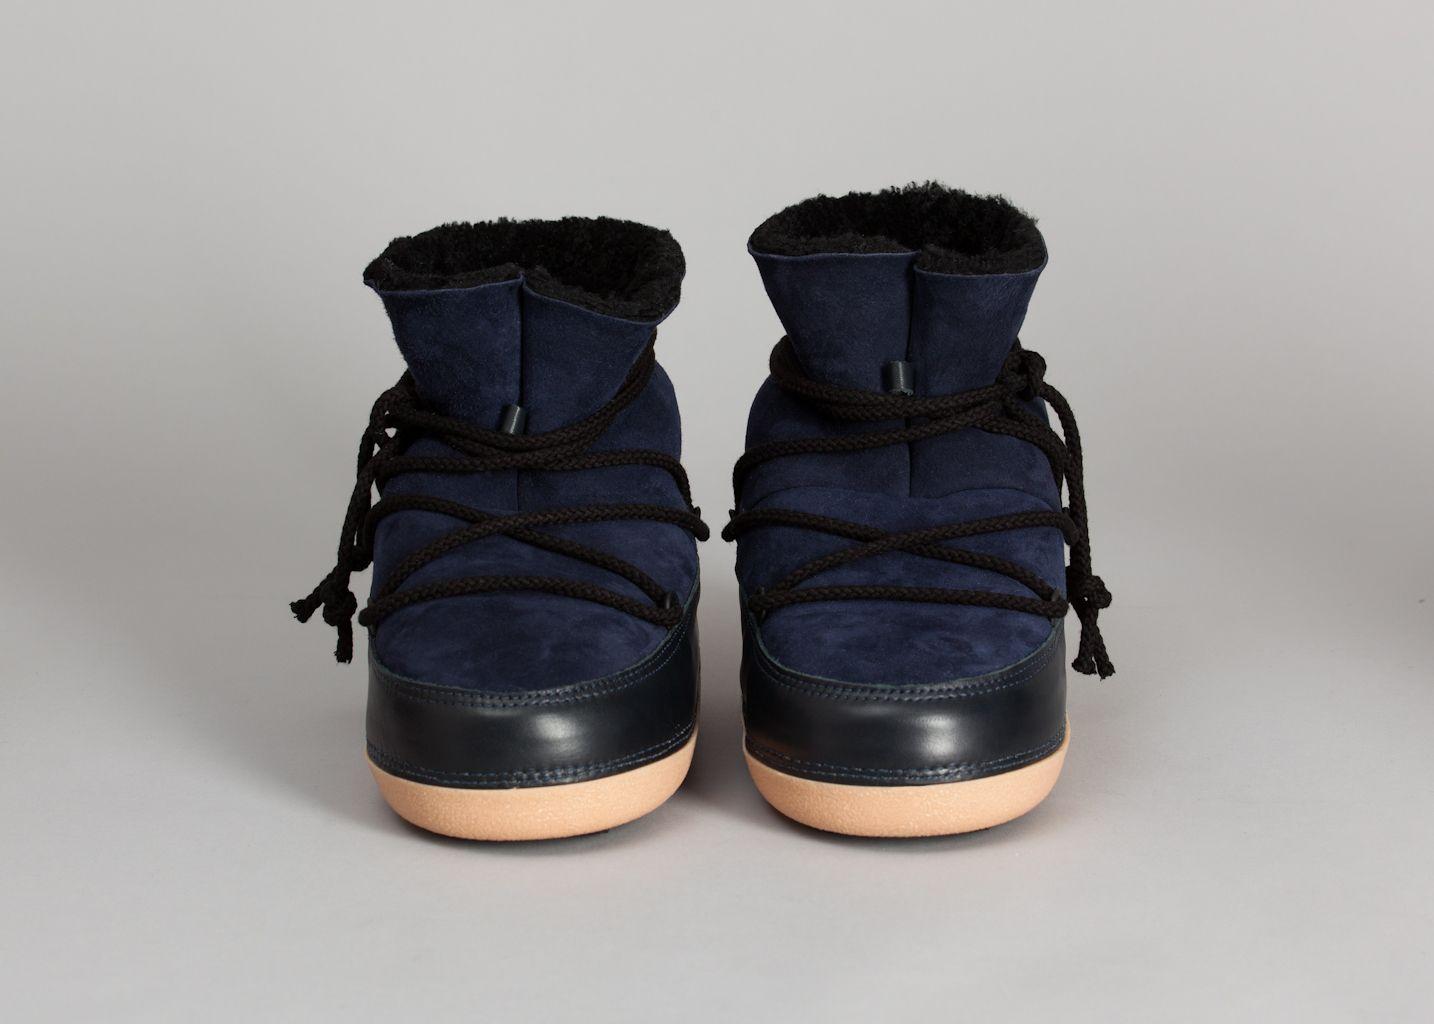 LES PRAIRIES DE PARIS Boots xjyrfelz